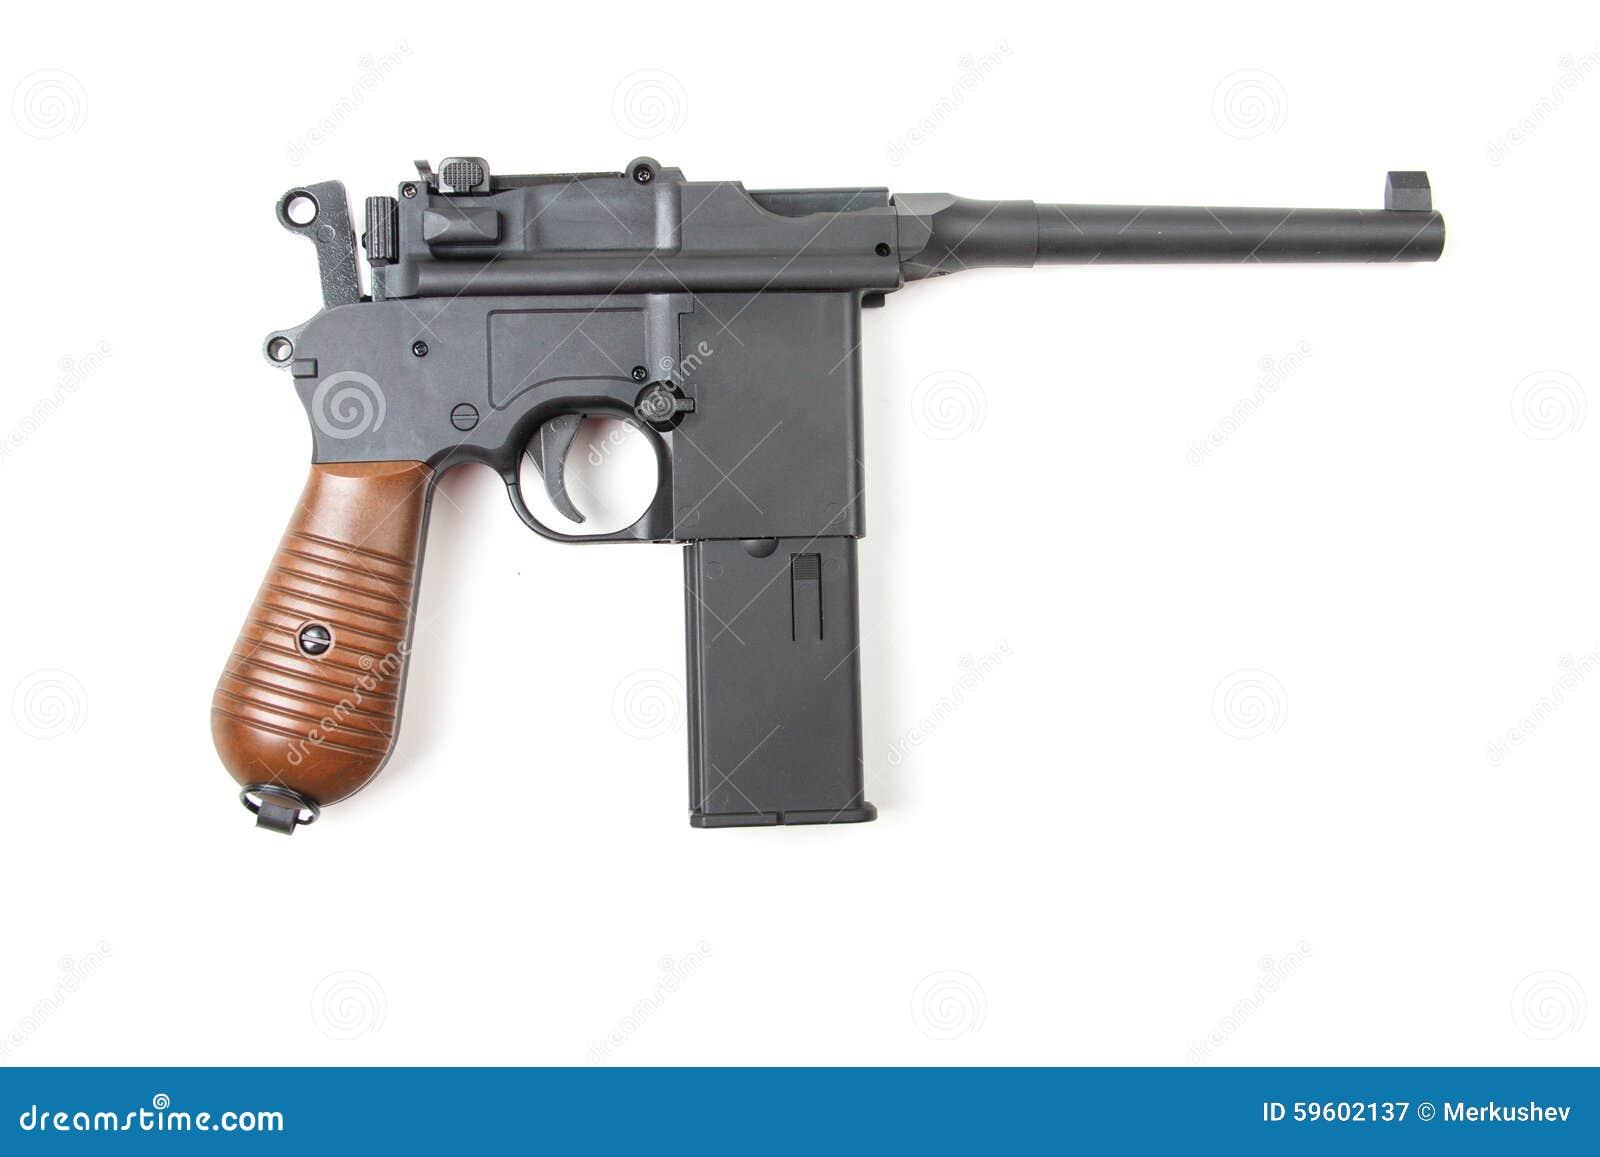 gun white background - photo #10